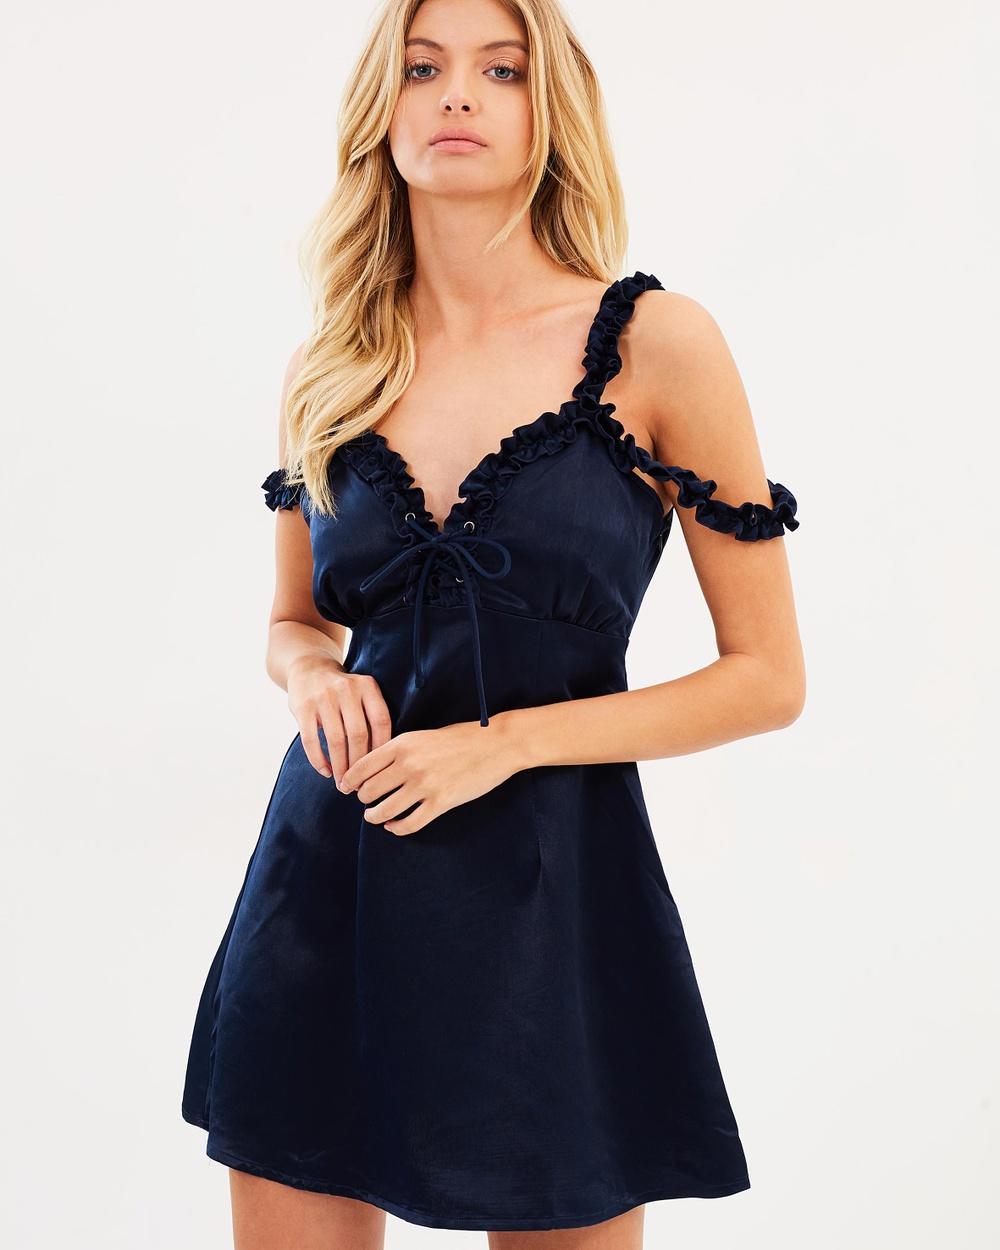 Atmos & Here ICONIC EXCLUSIVE Lola Mini Dress Dresses Ink ICONIC EXCLUSIVE Lola Mini Dress